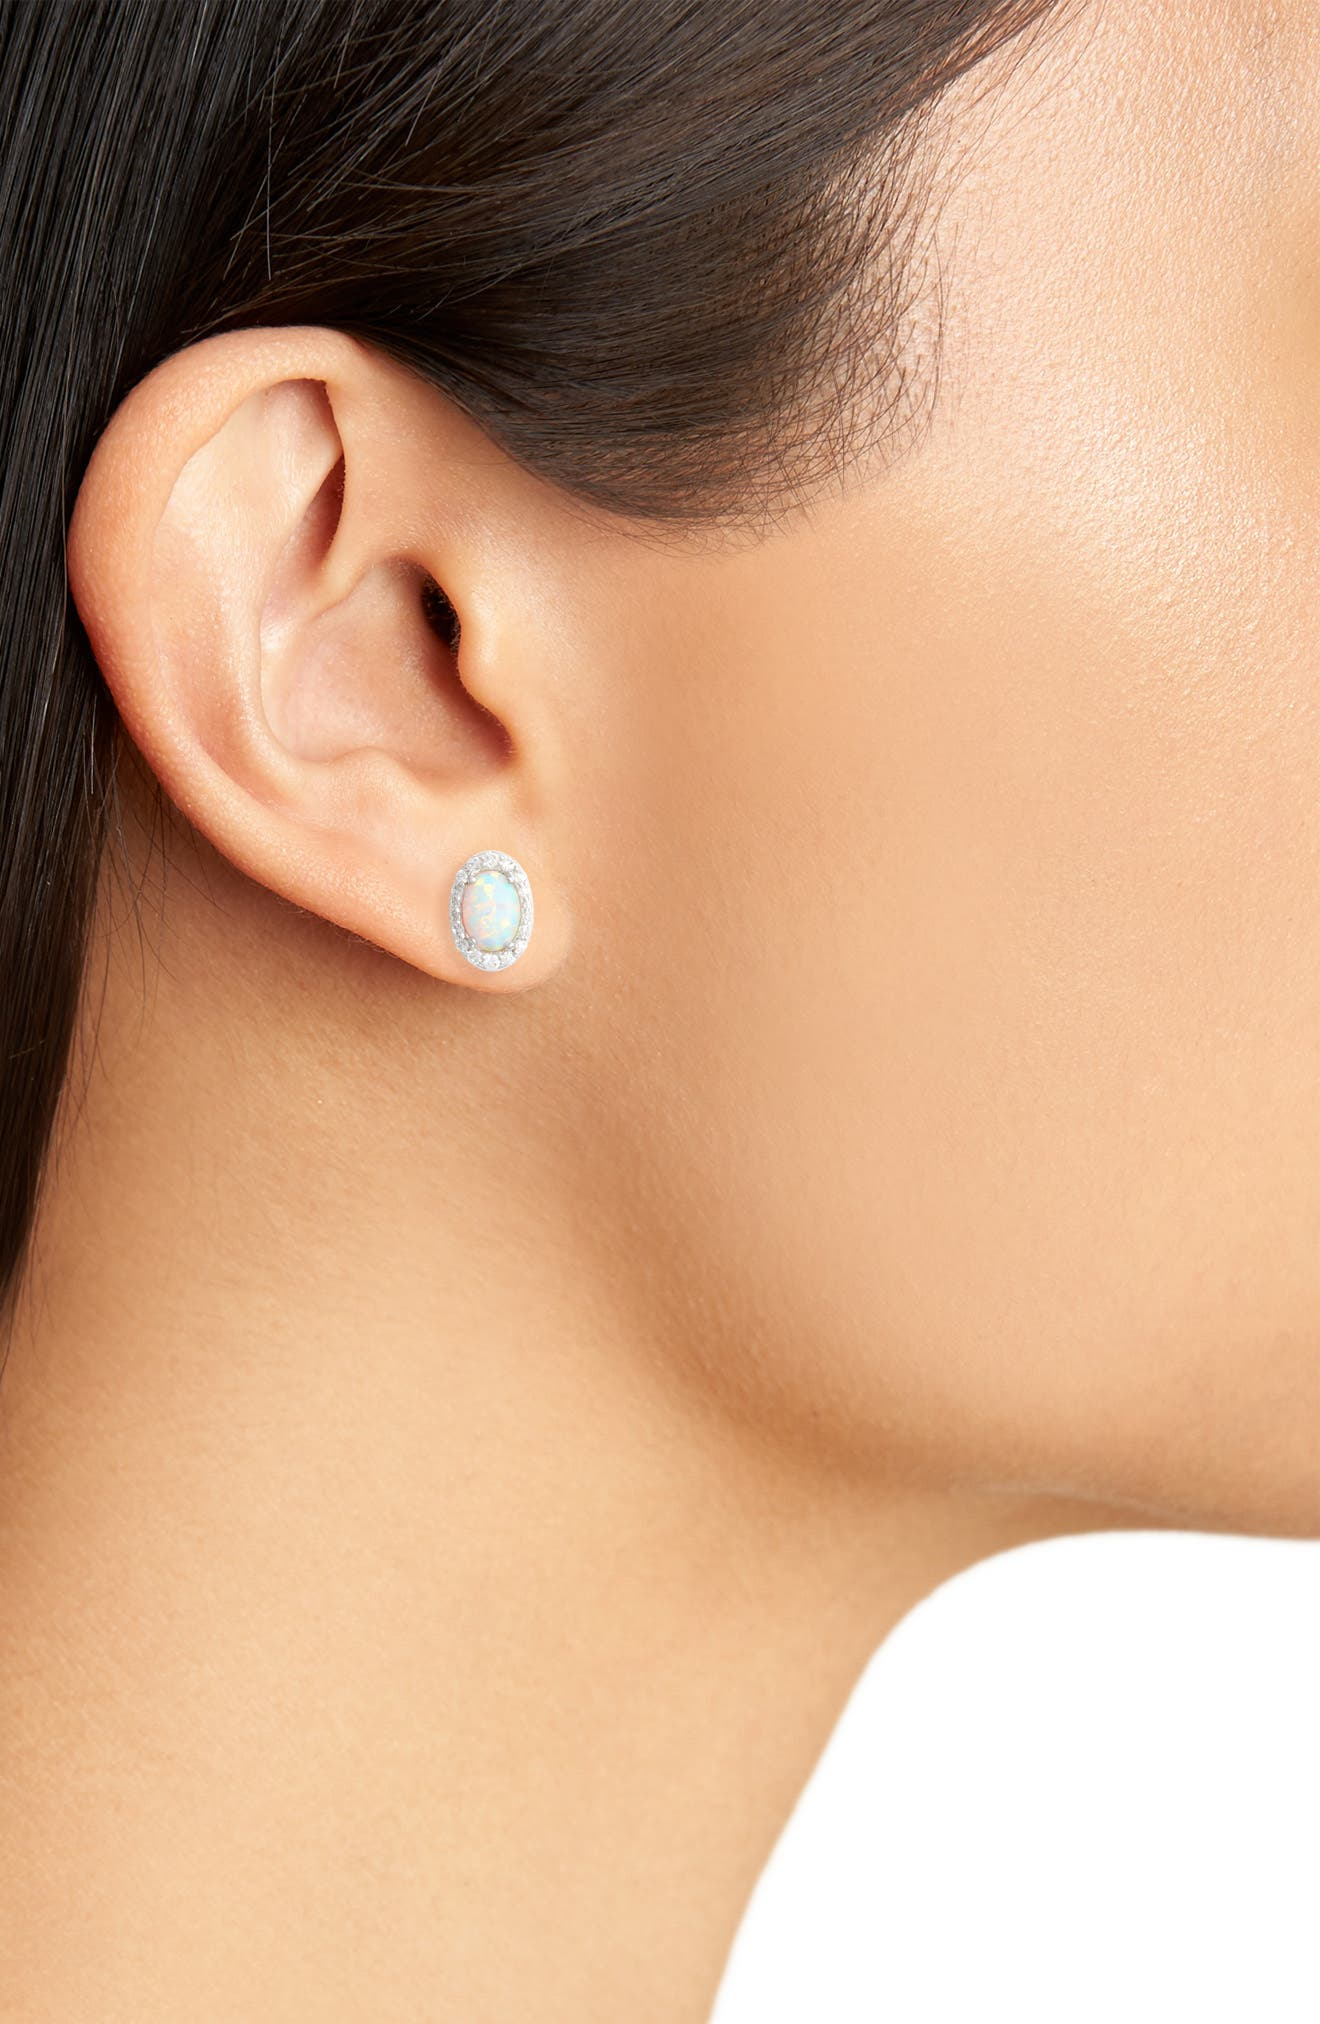 LAFONN,                             Simulated Opal Halo Stud Earrings,                             Alternate thumbnail 2, color,                             SILVER/ OPAL/ CLEAR